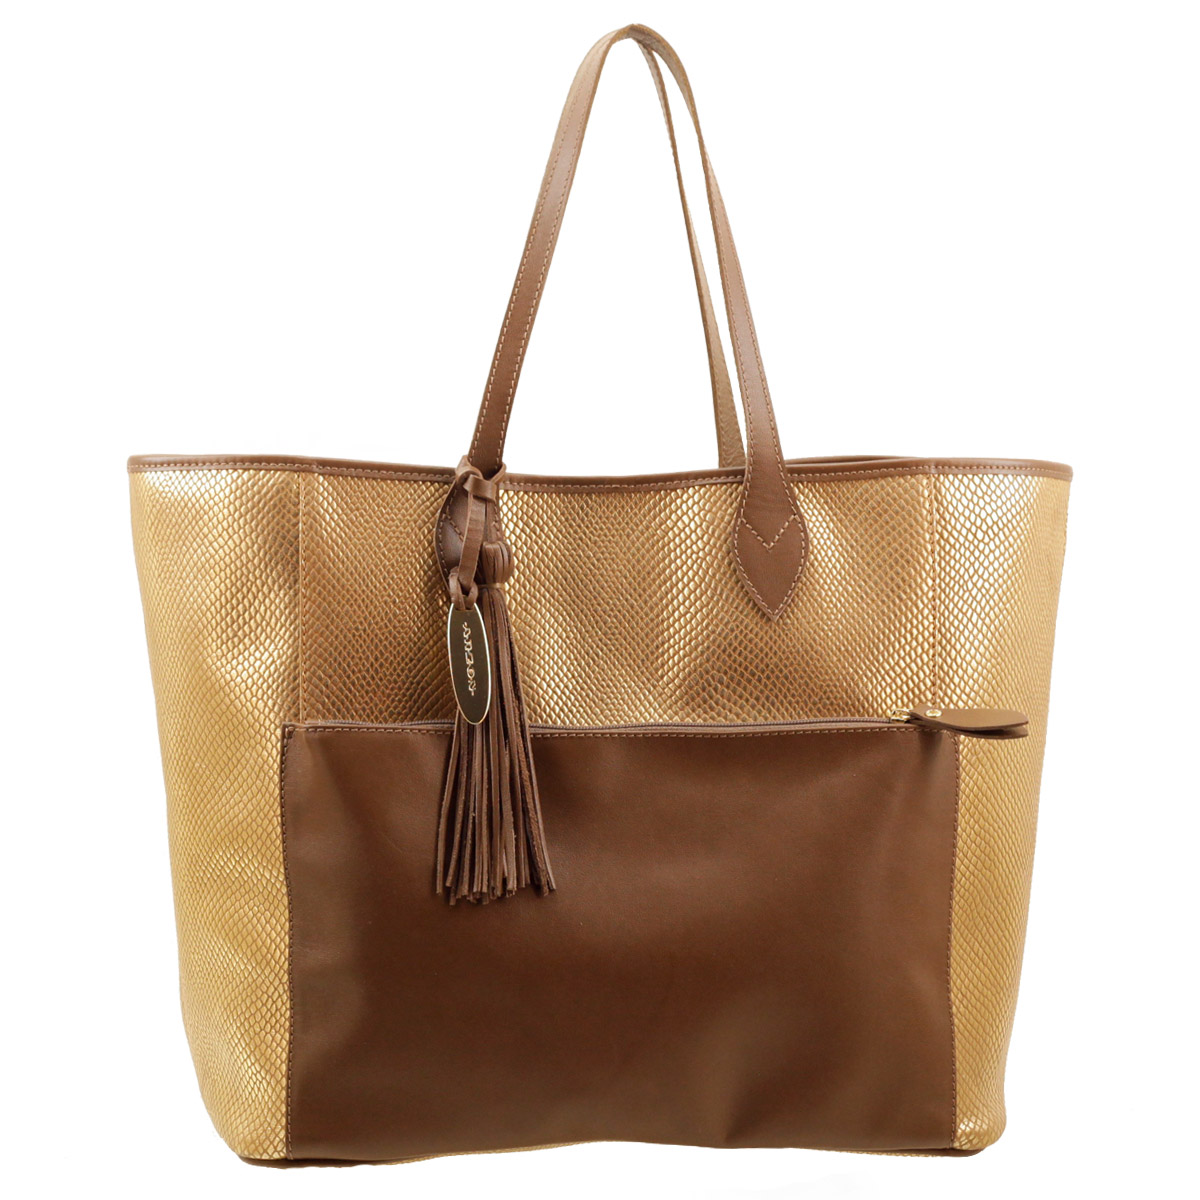 Bolsa Sacola Maxi Gold com Tan